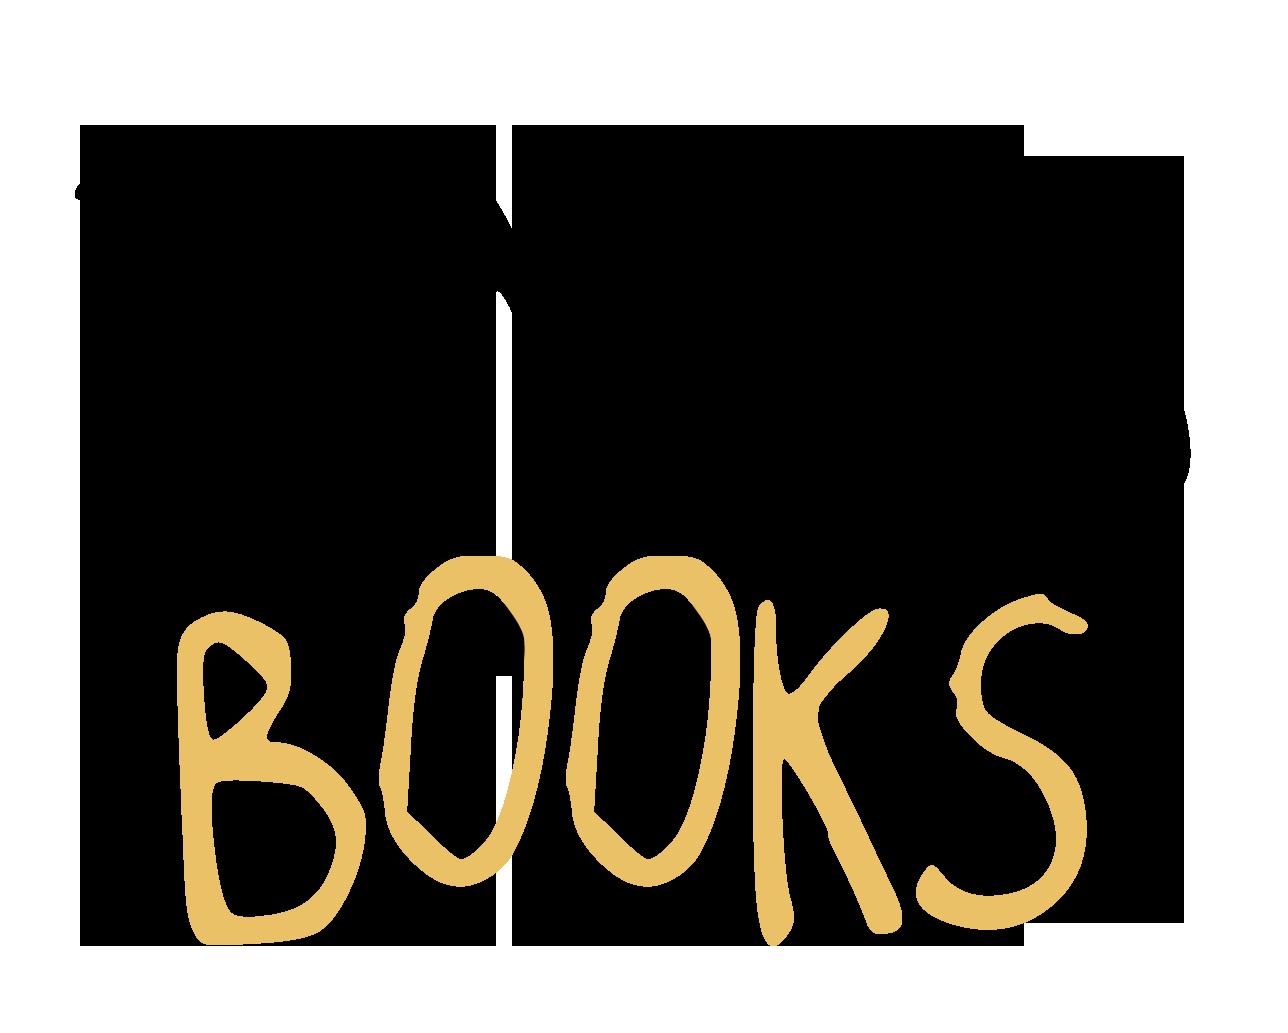 Tantor Books